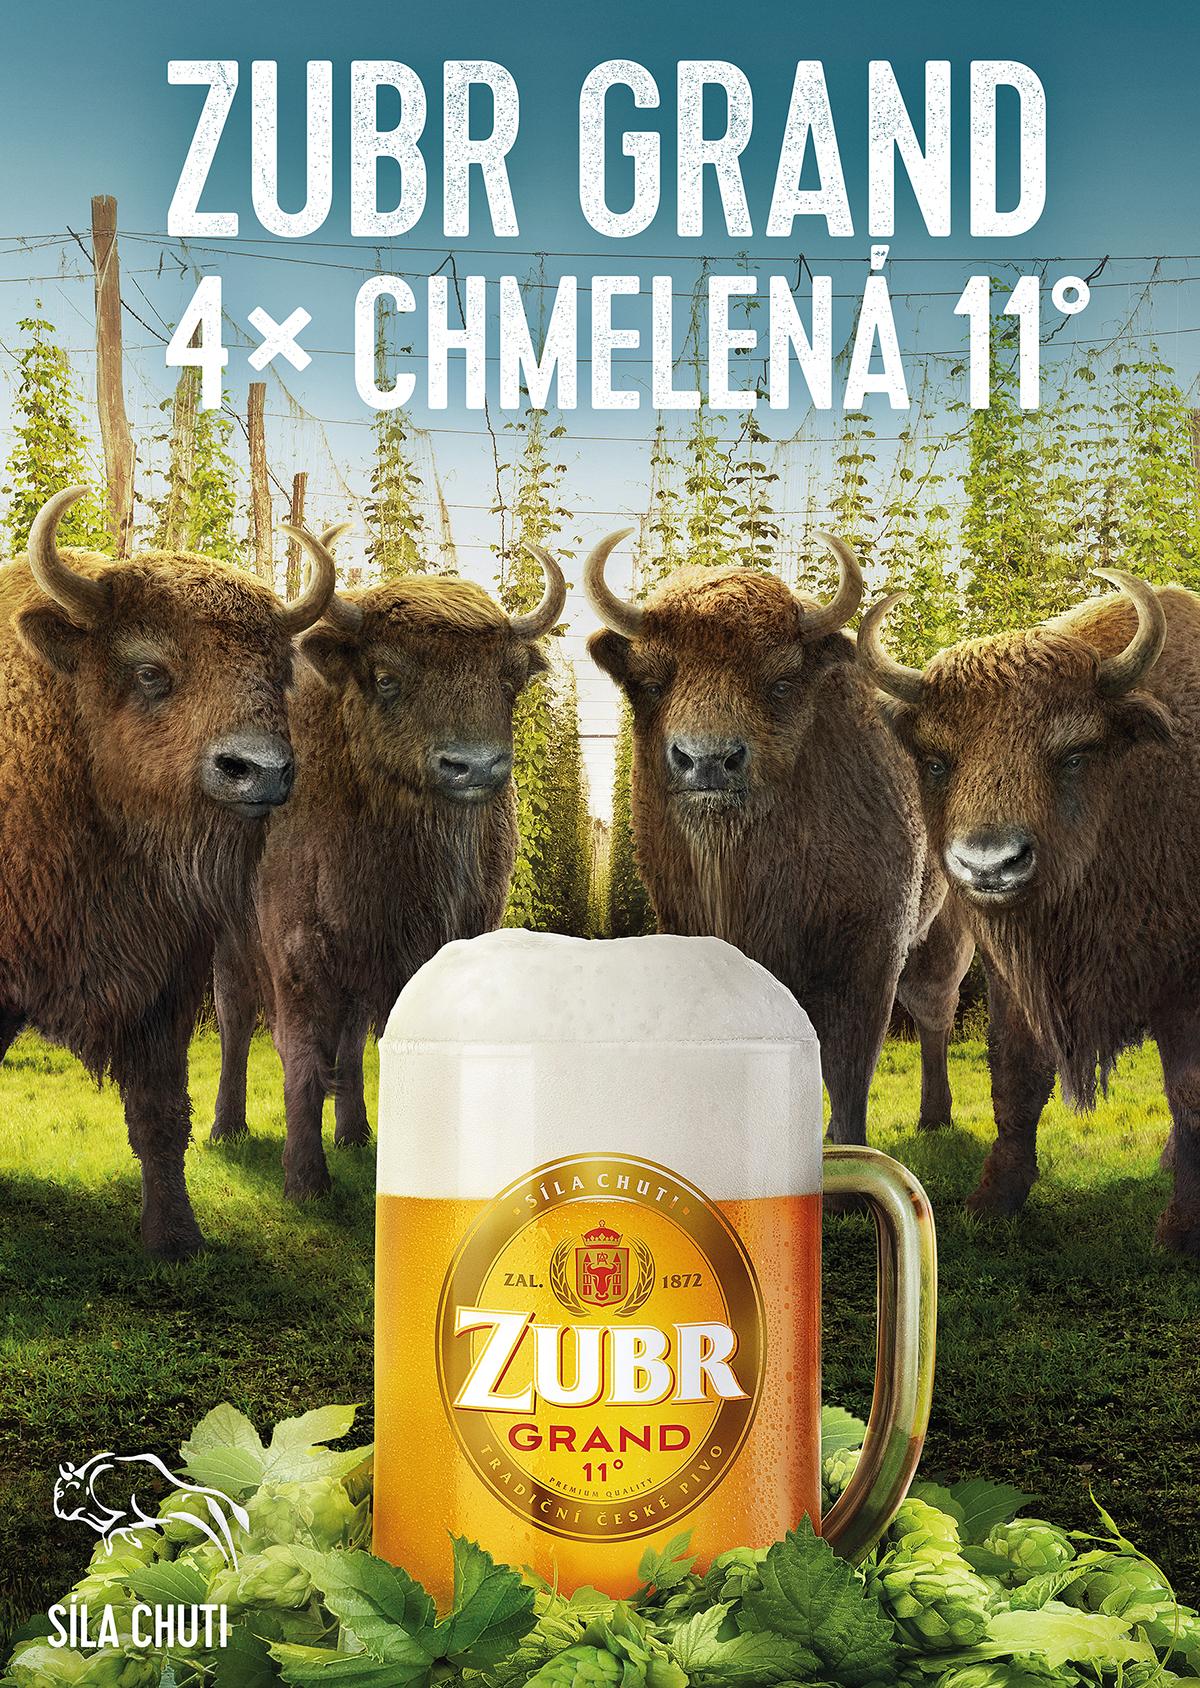 beer zubr animal CGI Nature Sun green Fur 3D retouch mattepaint cheers